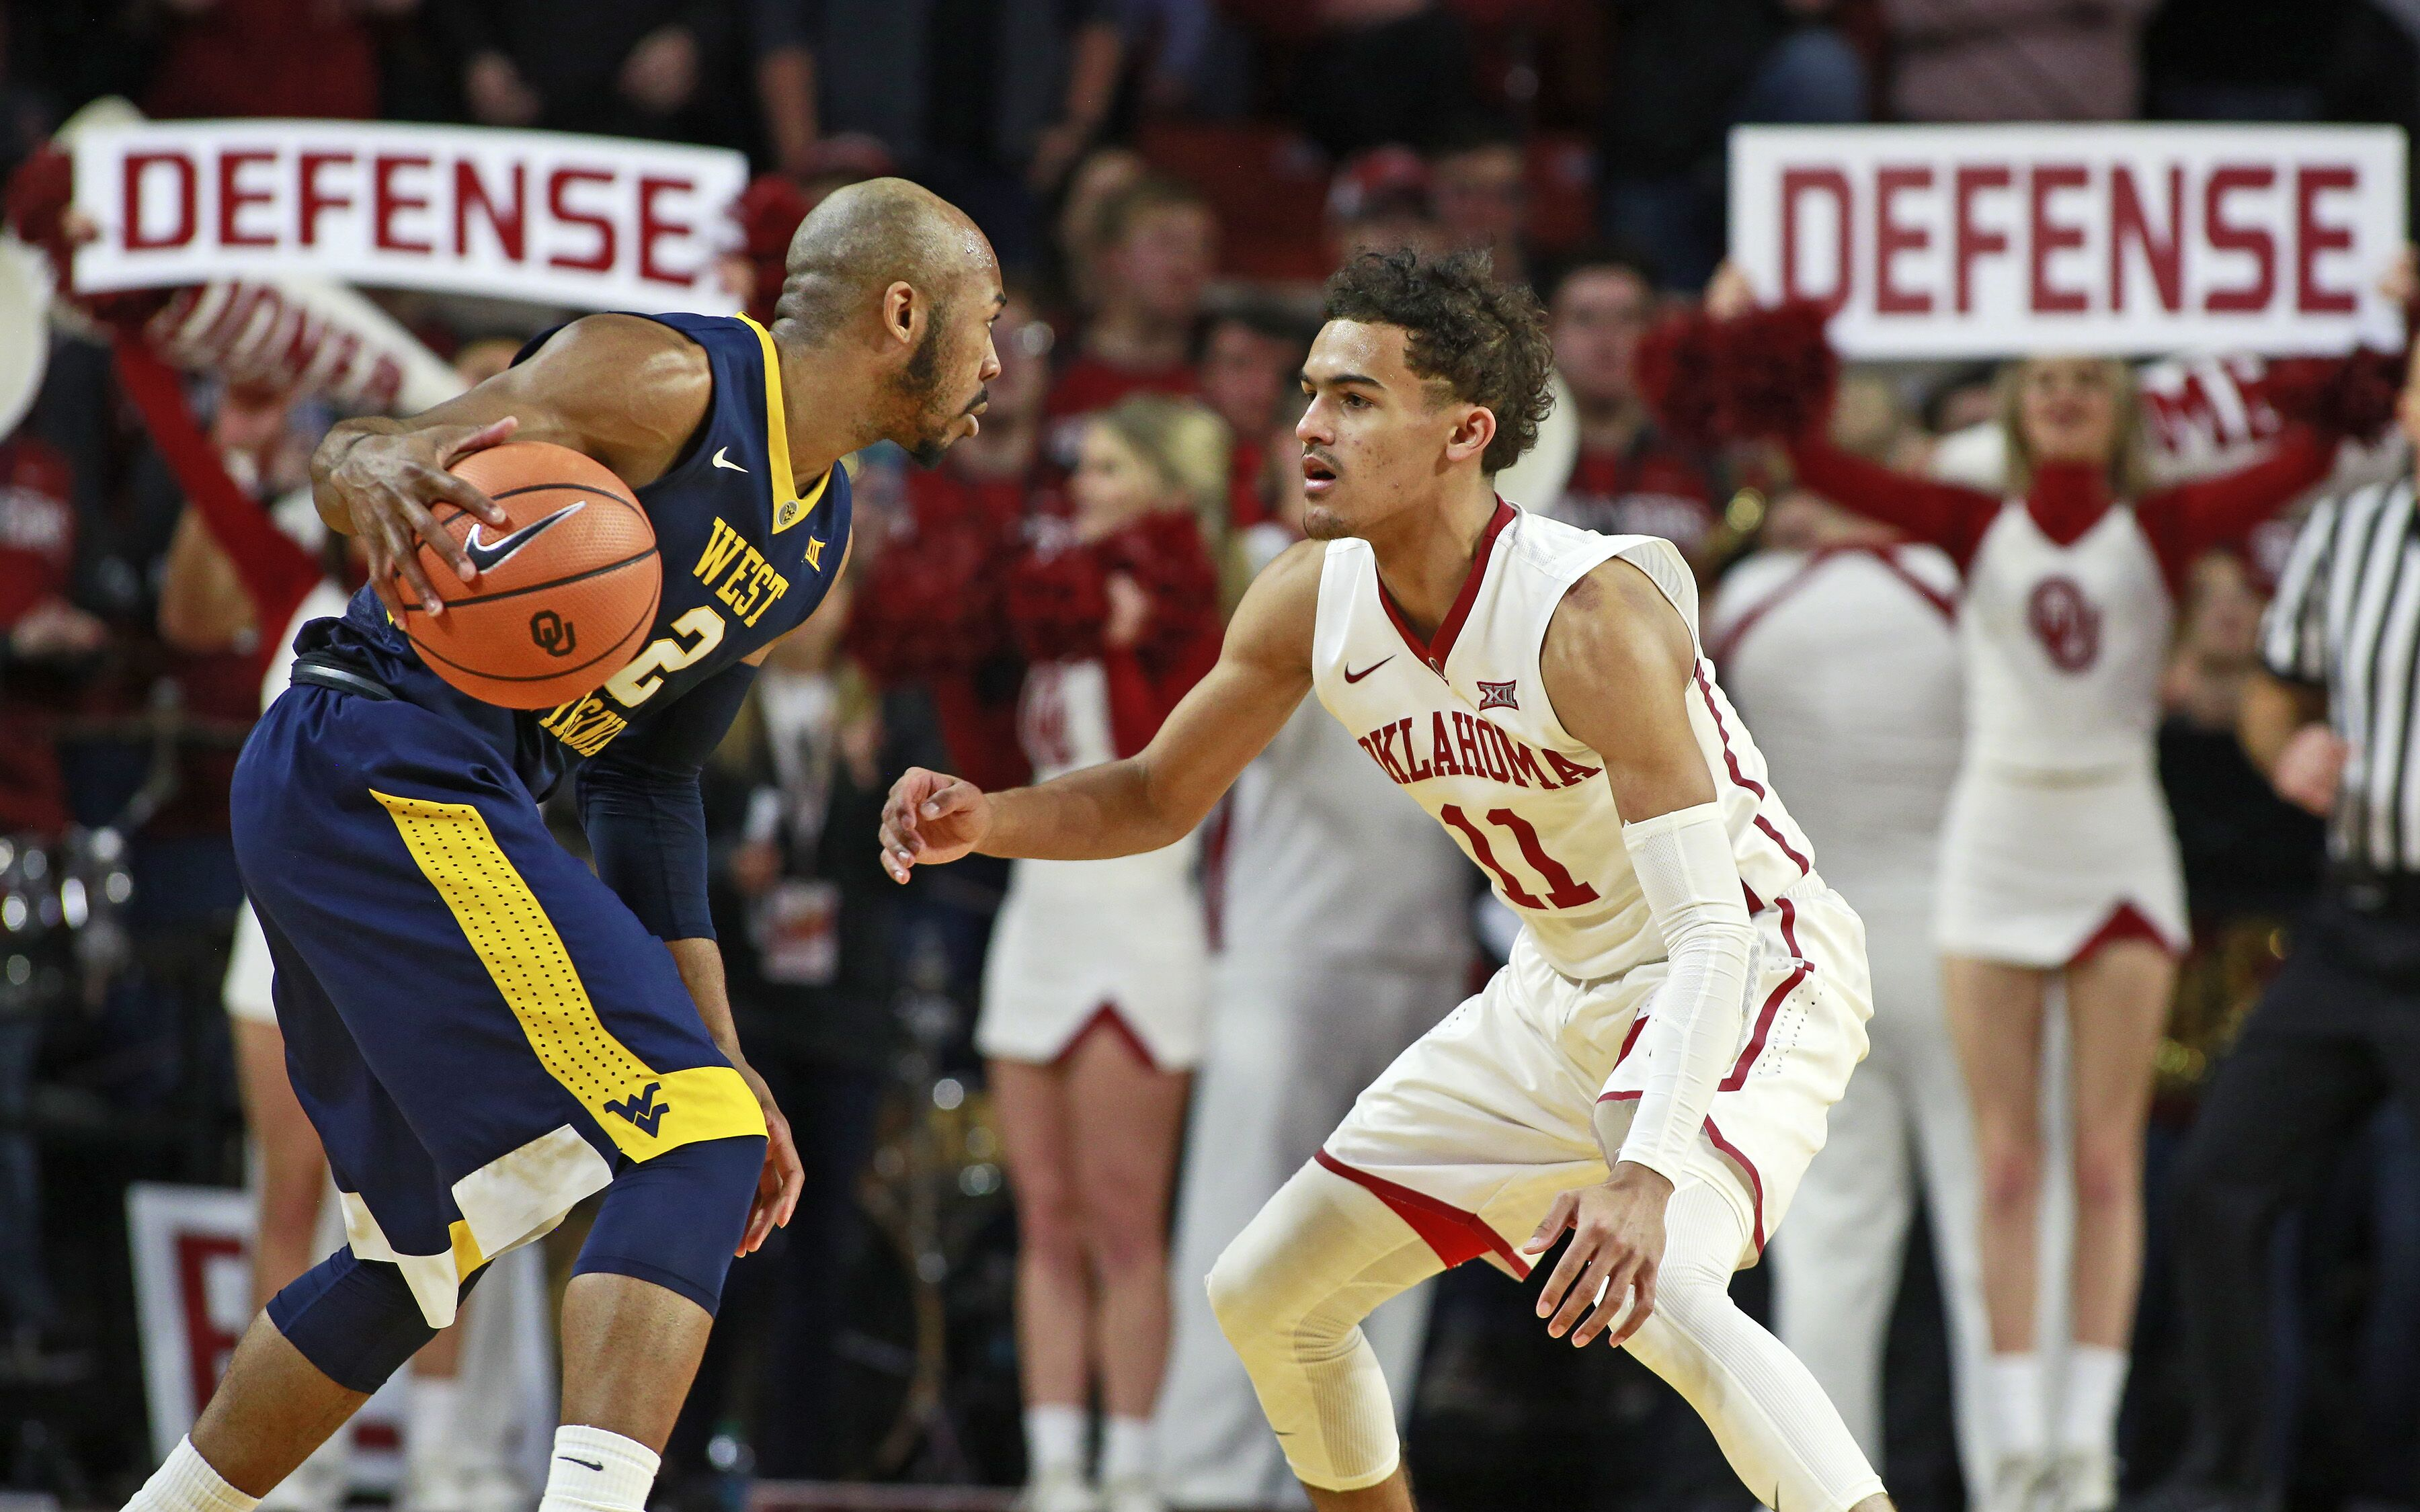 Big 12 Basketball: 2018-19 preseason all-conference and awards